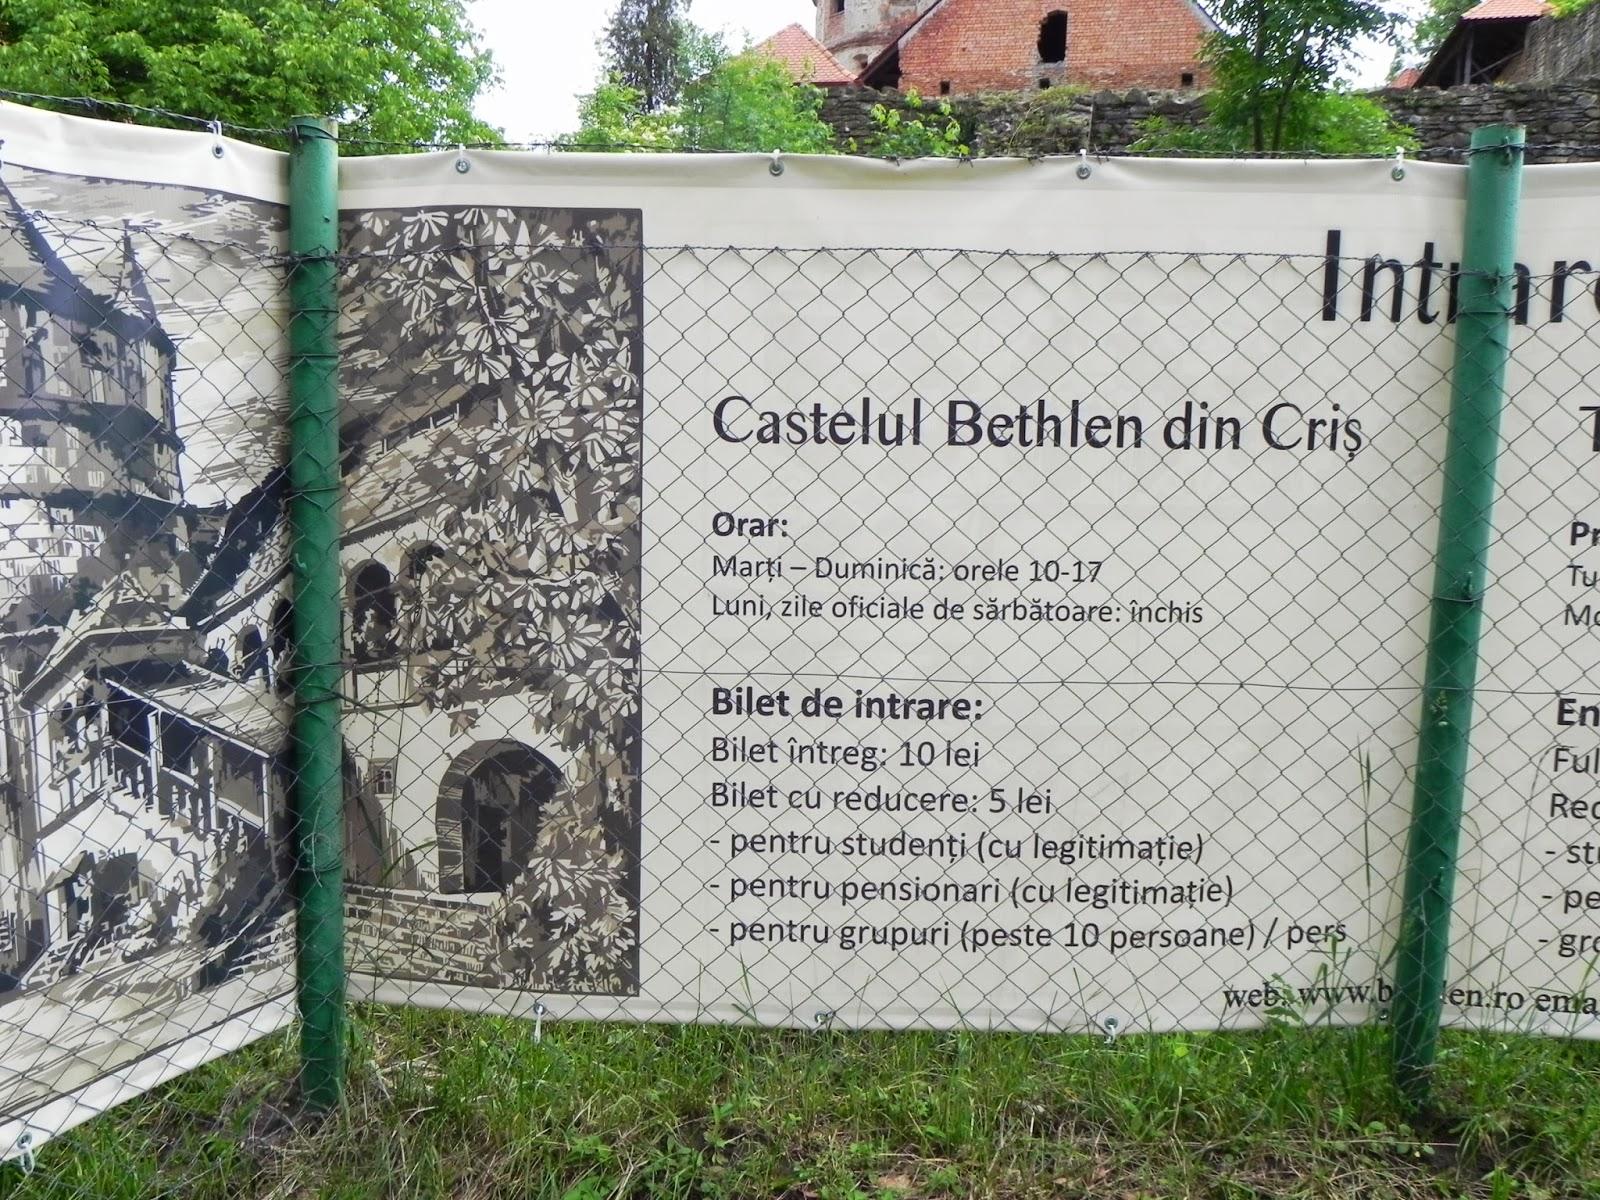 Informatii despre castel